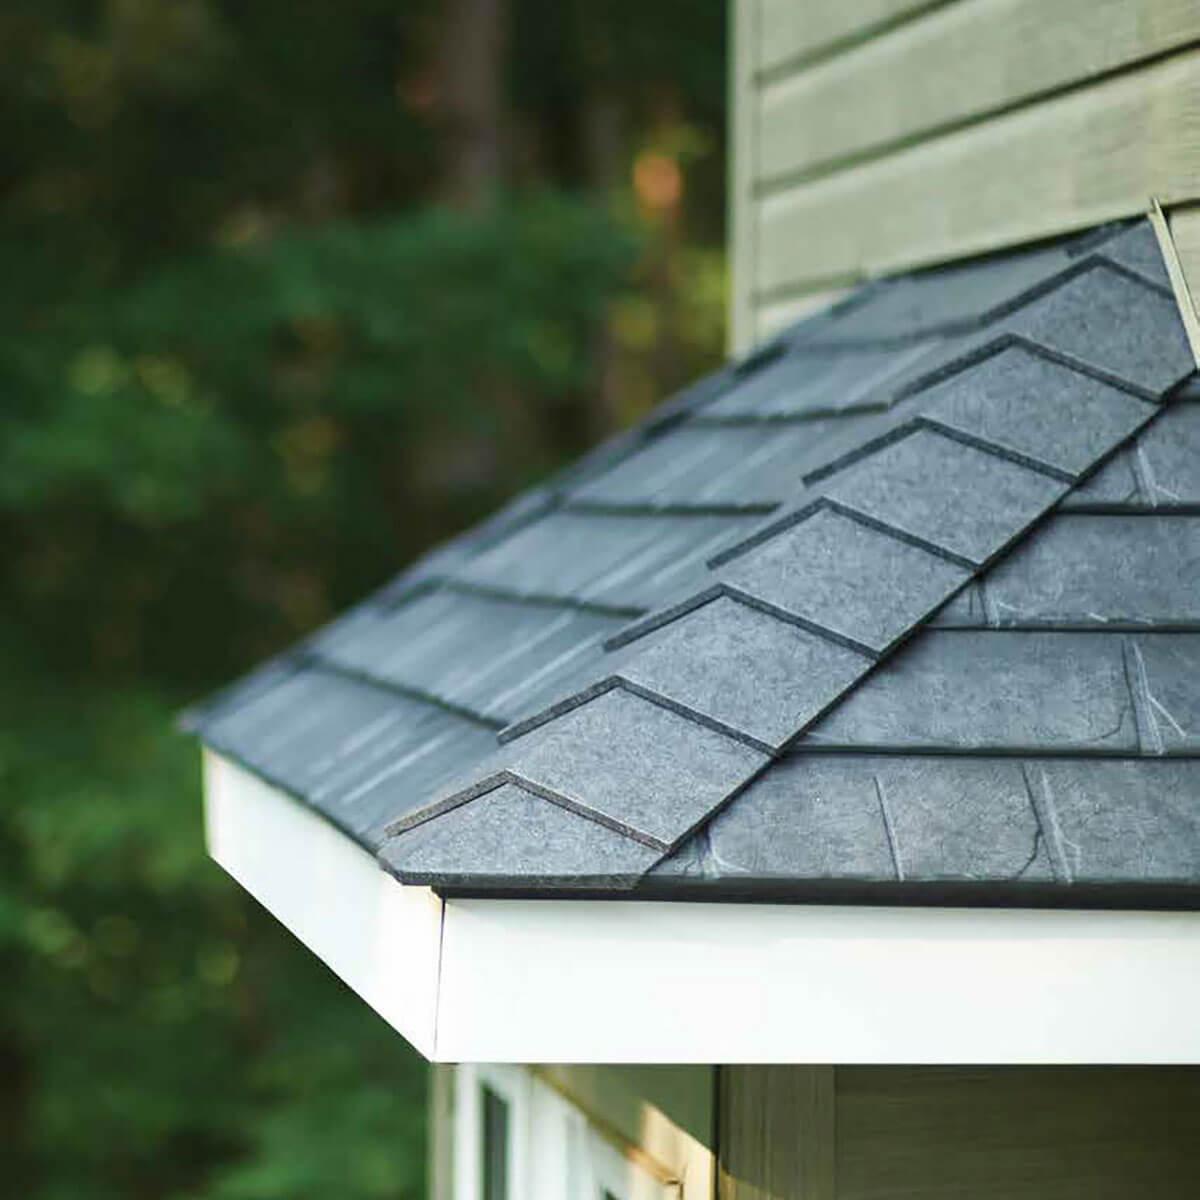 PGMin 100350105 1 - Certainteed - Matterhorn Metal Roofing Slate